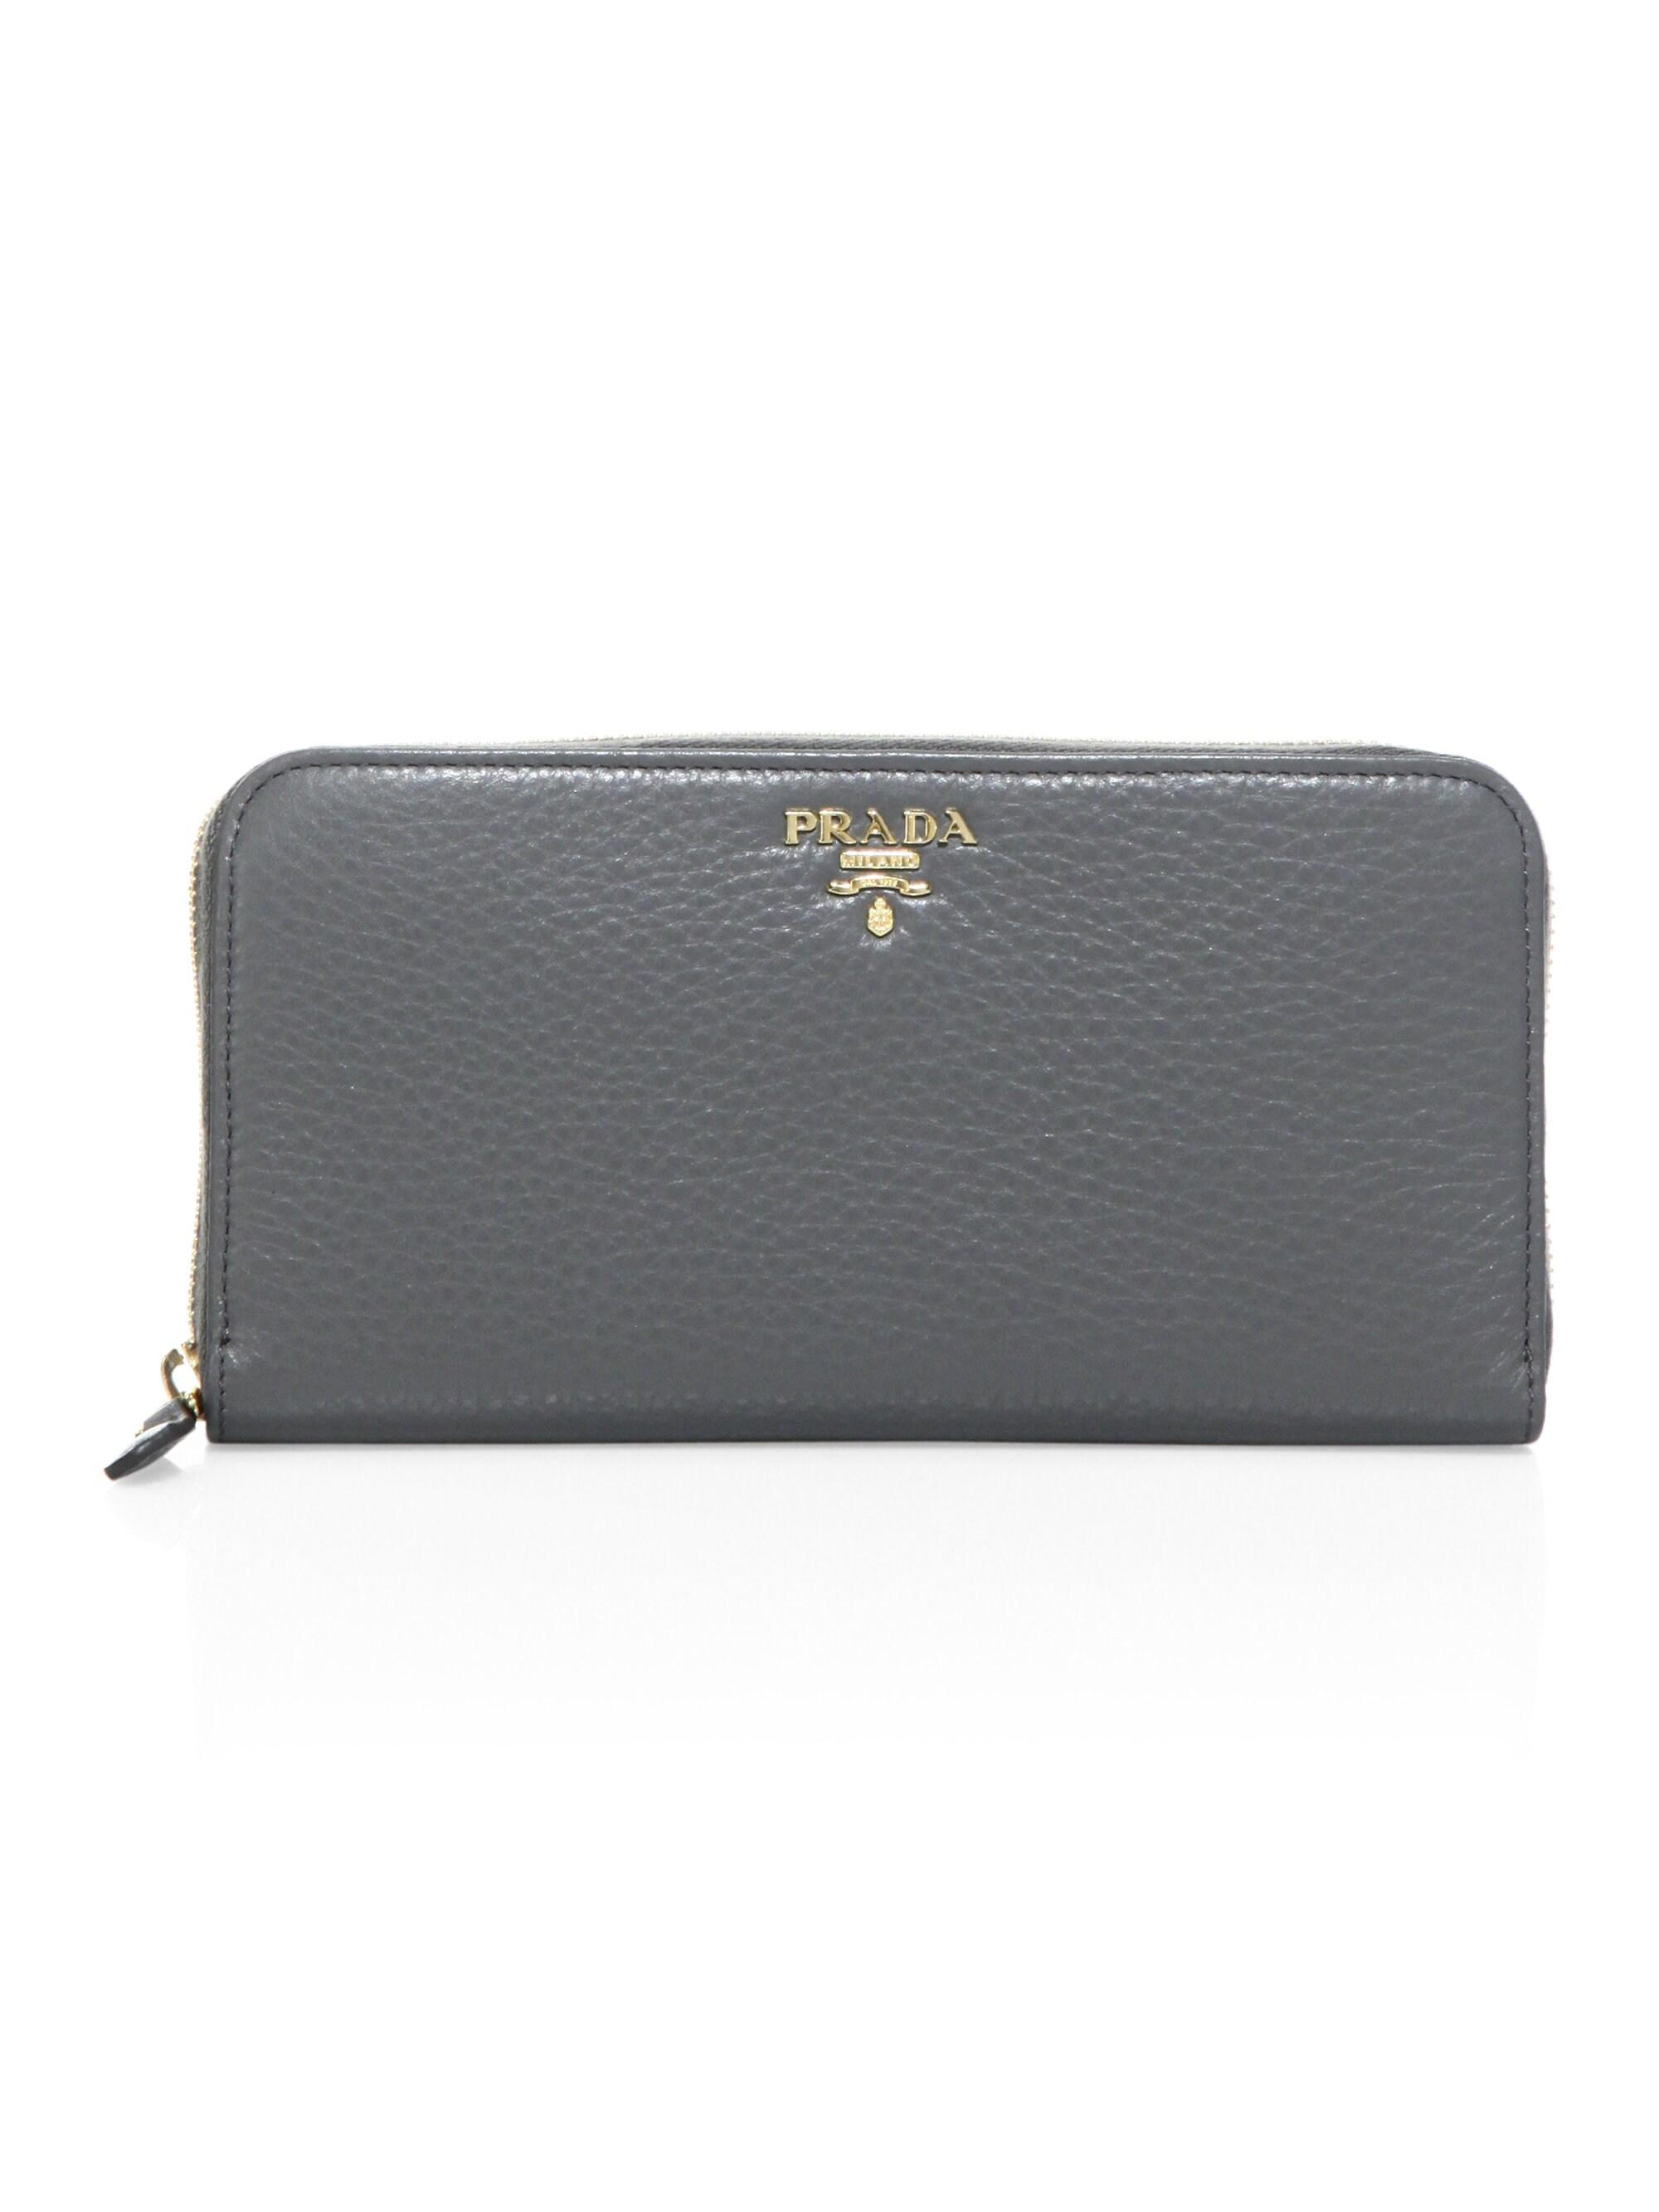 53b8d0a4d7f0f4 Prada Women's Leather Zip-around Wallet - Caramel Papaya in Gray - Lyst